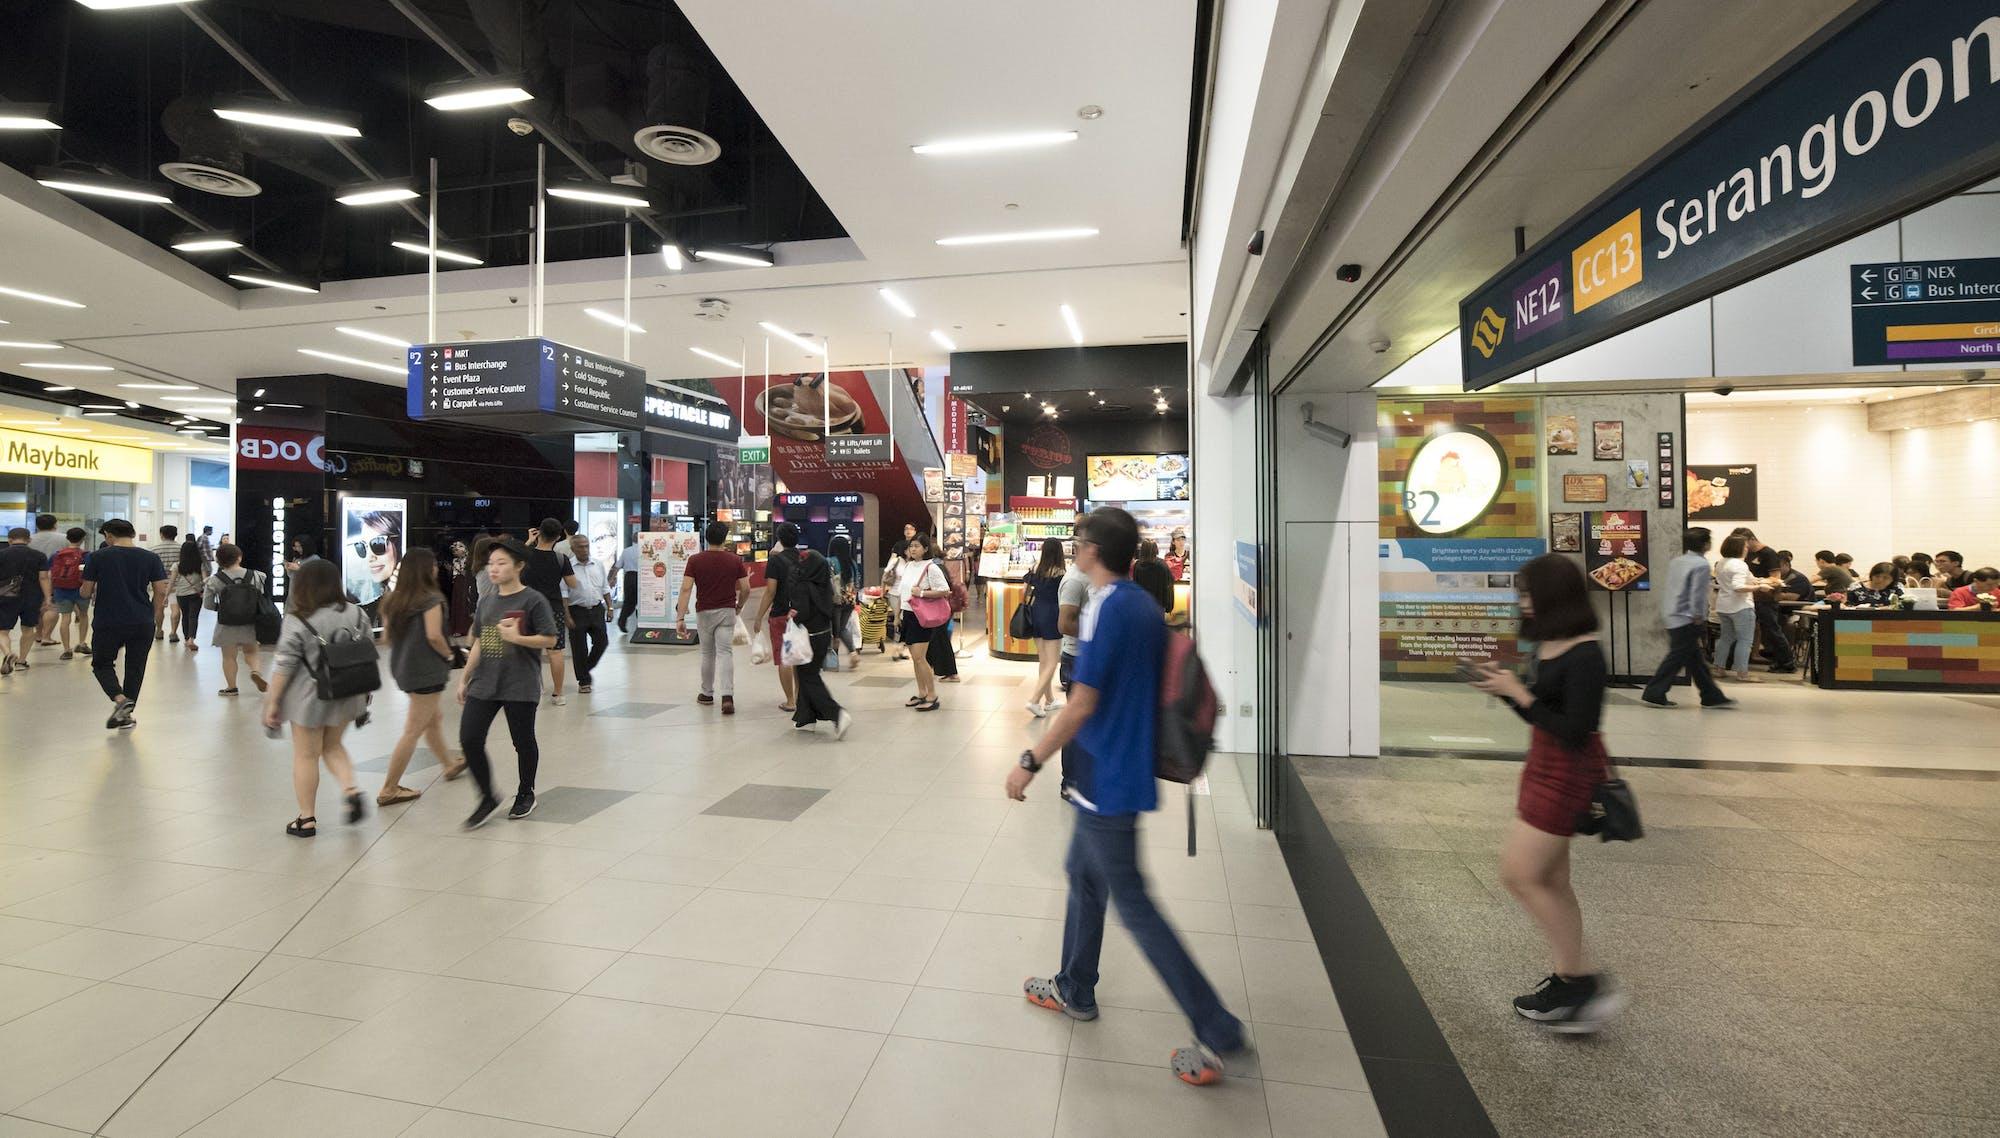 Serangoon MRT Station